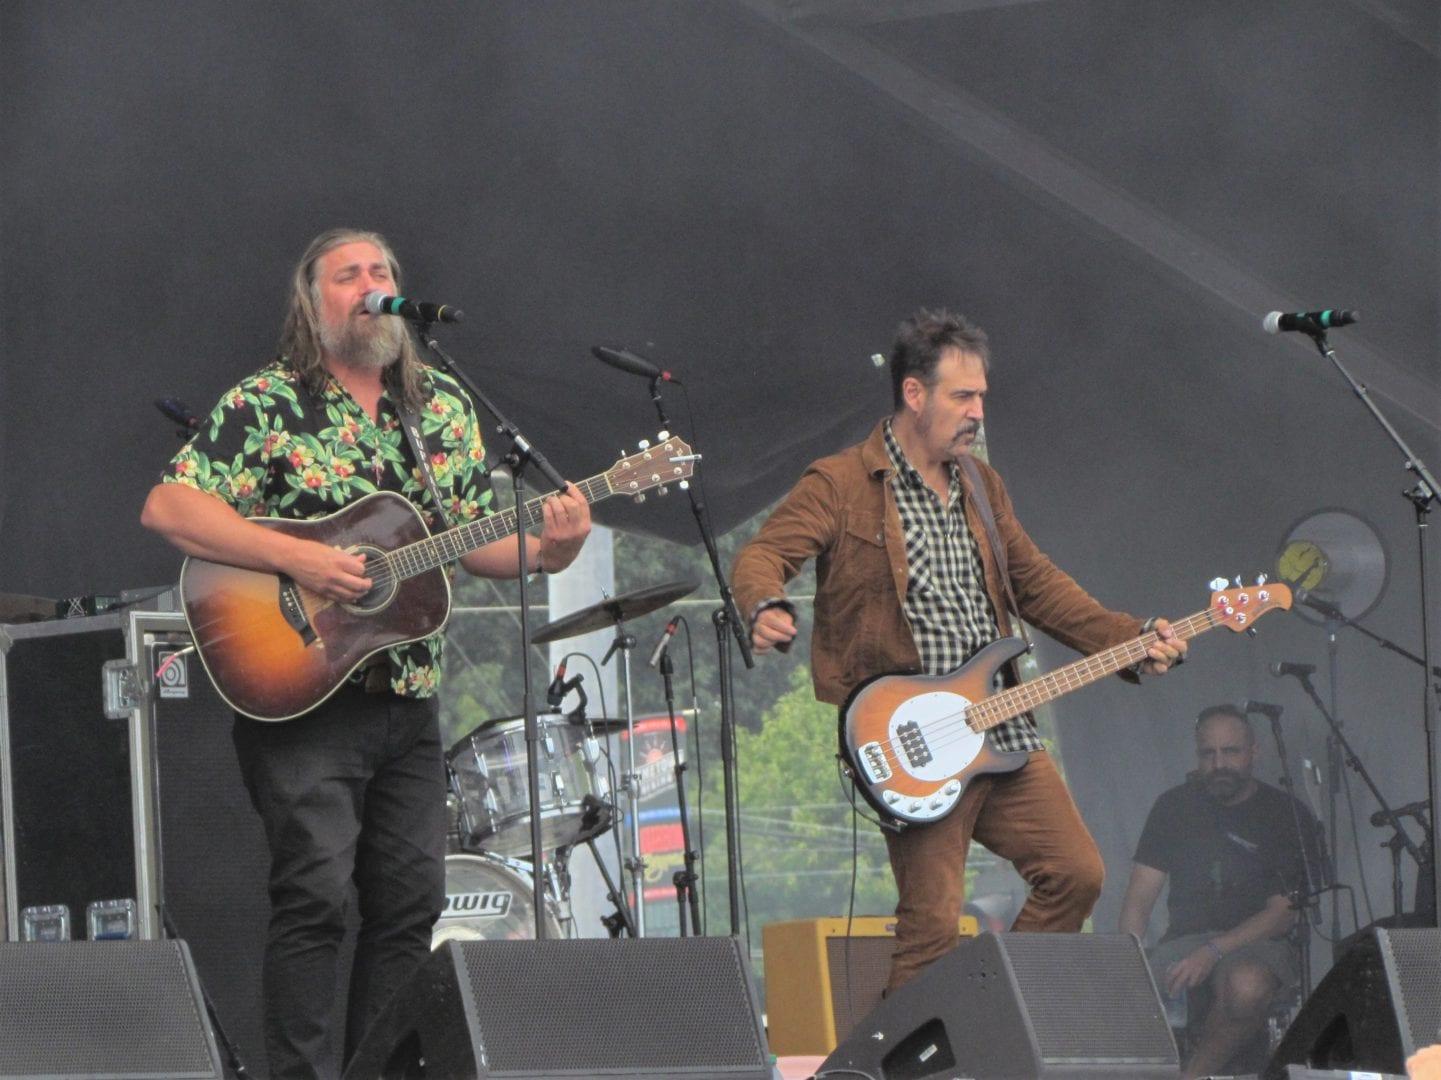 The White Buffalo playing their guitars